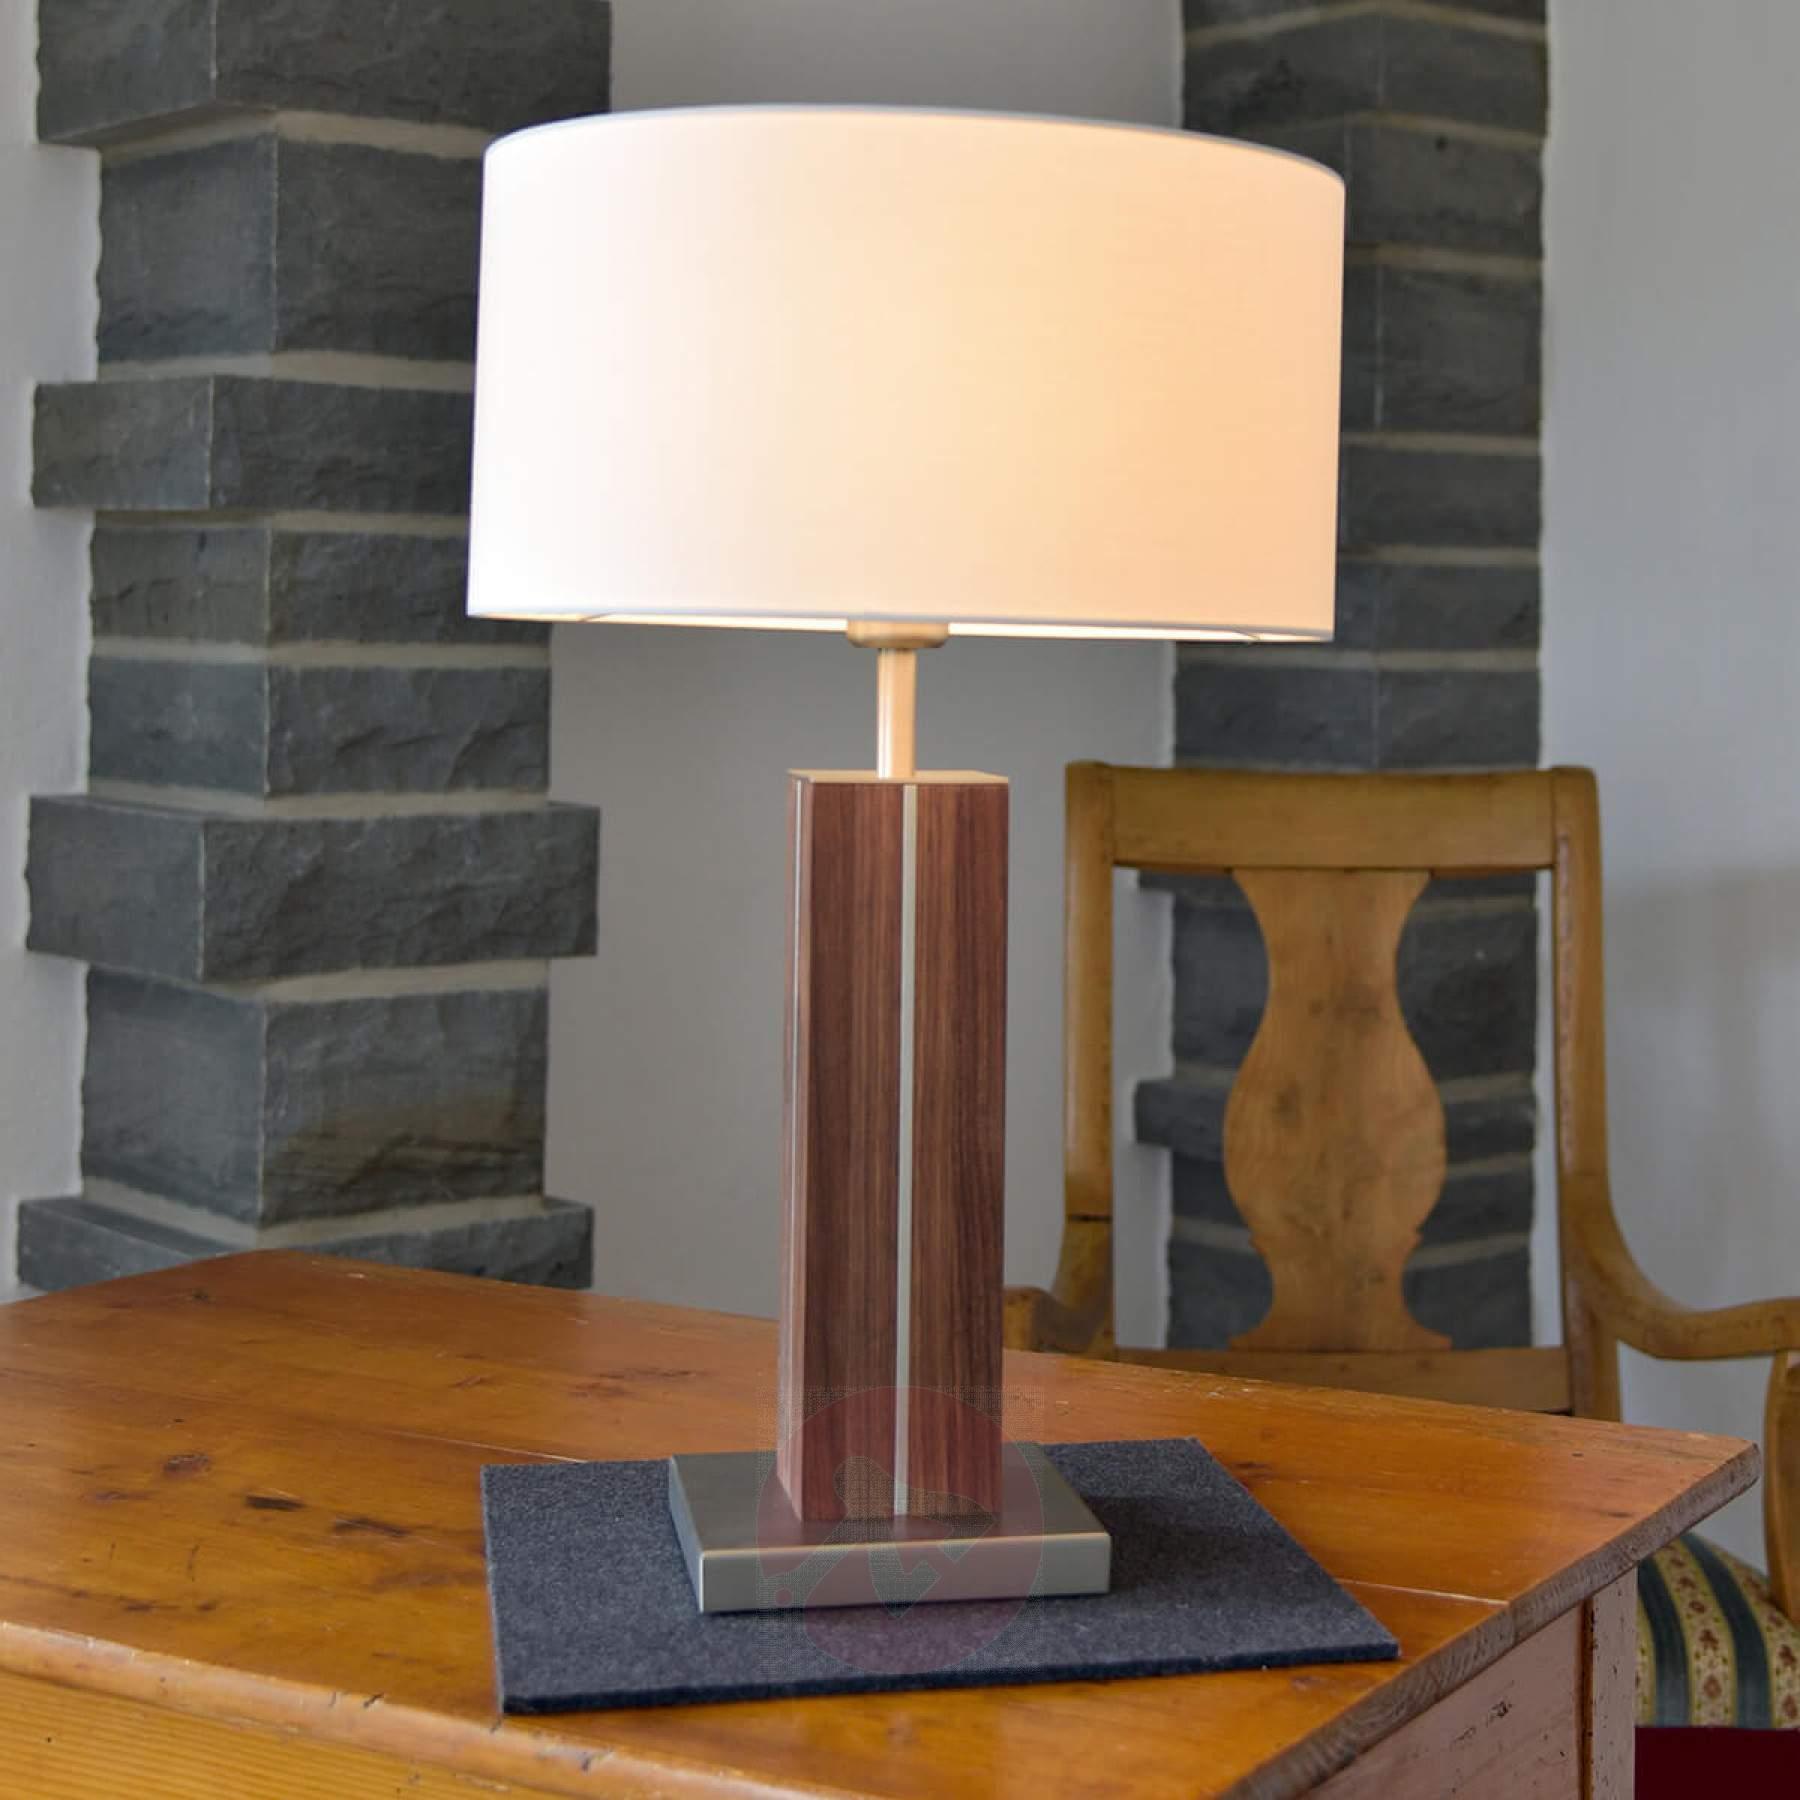 Lampe a poser design bois